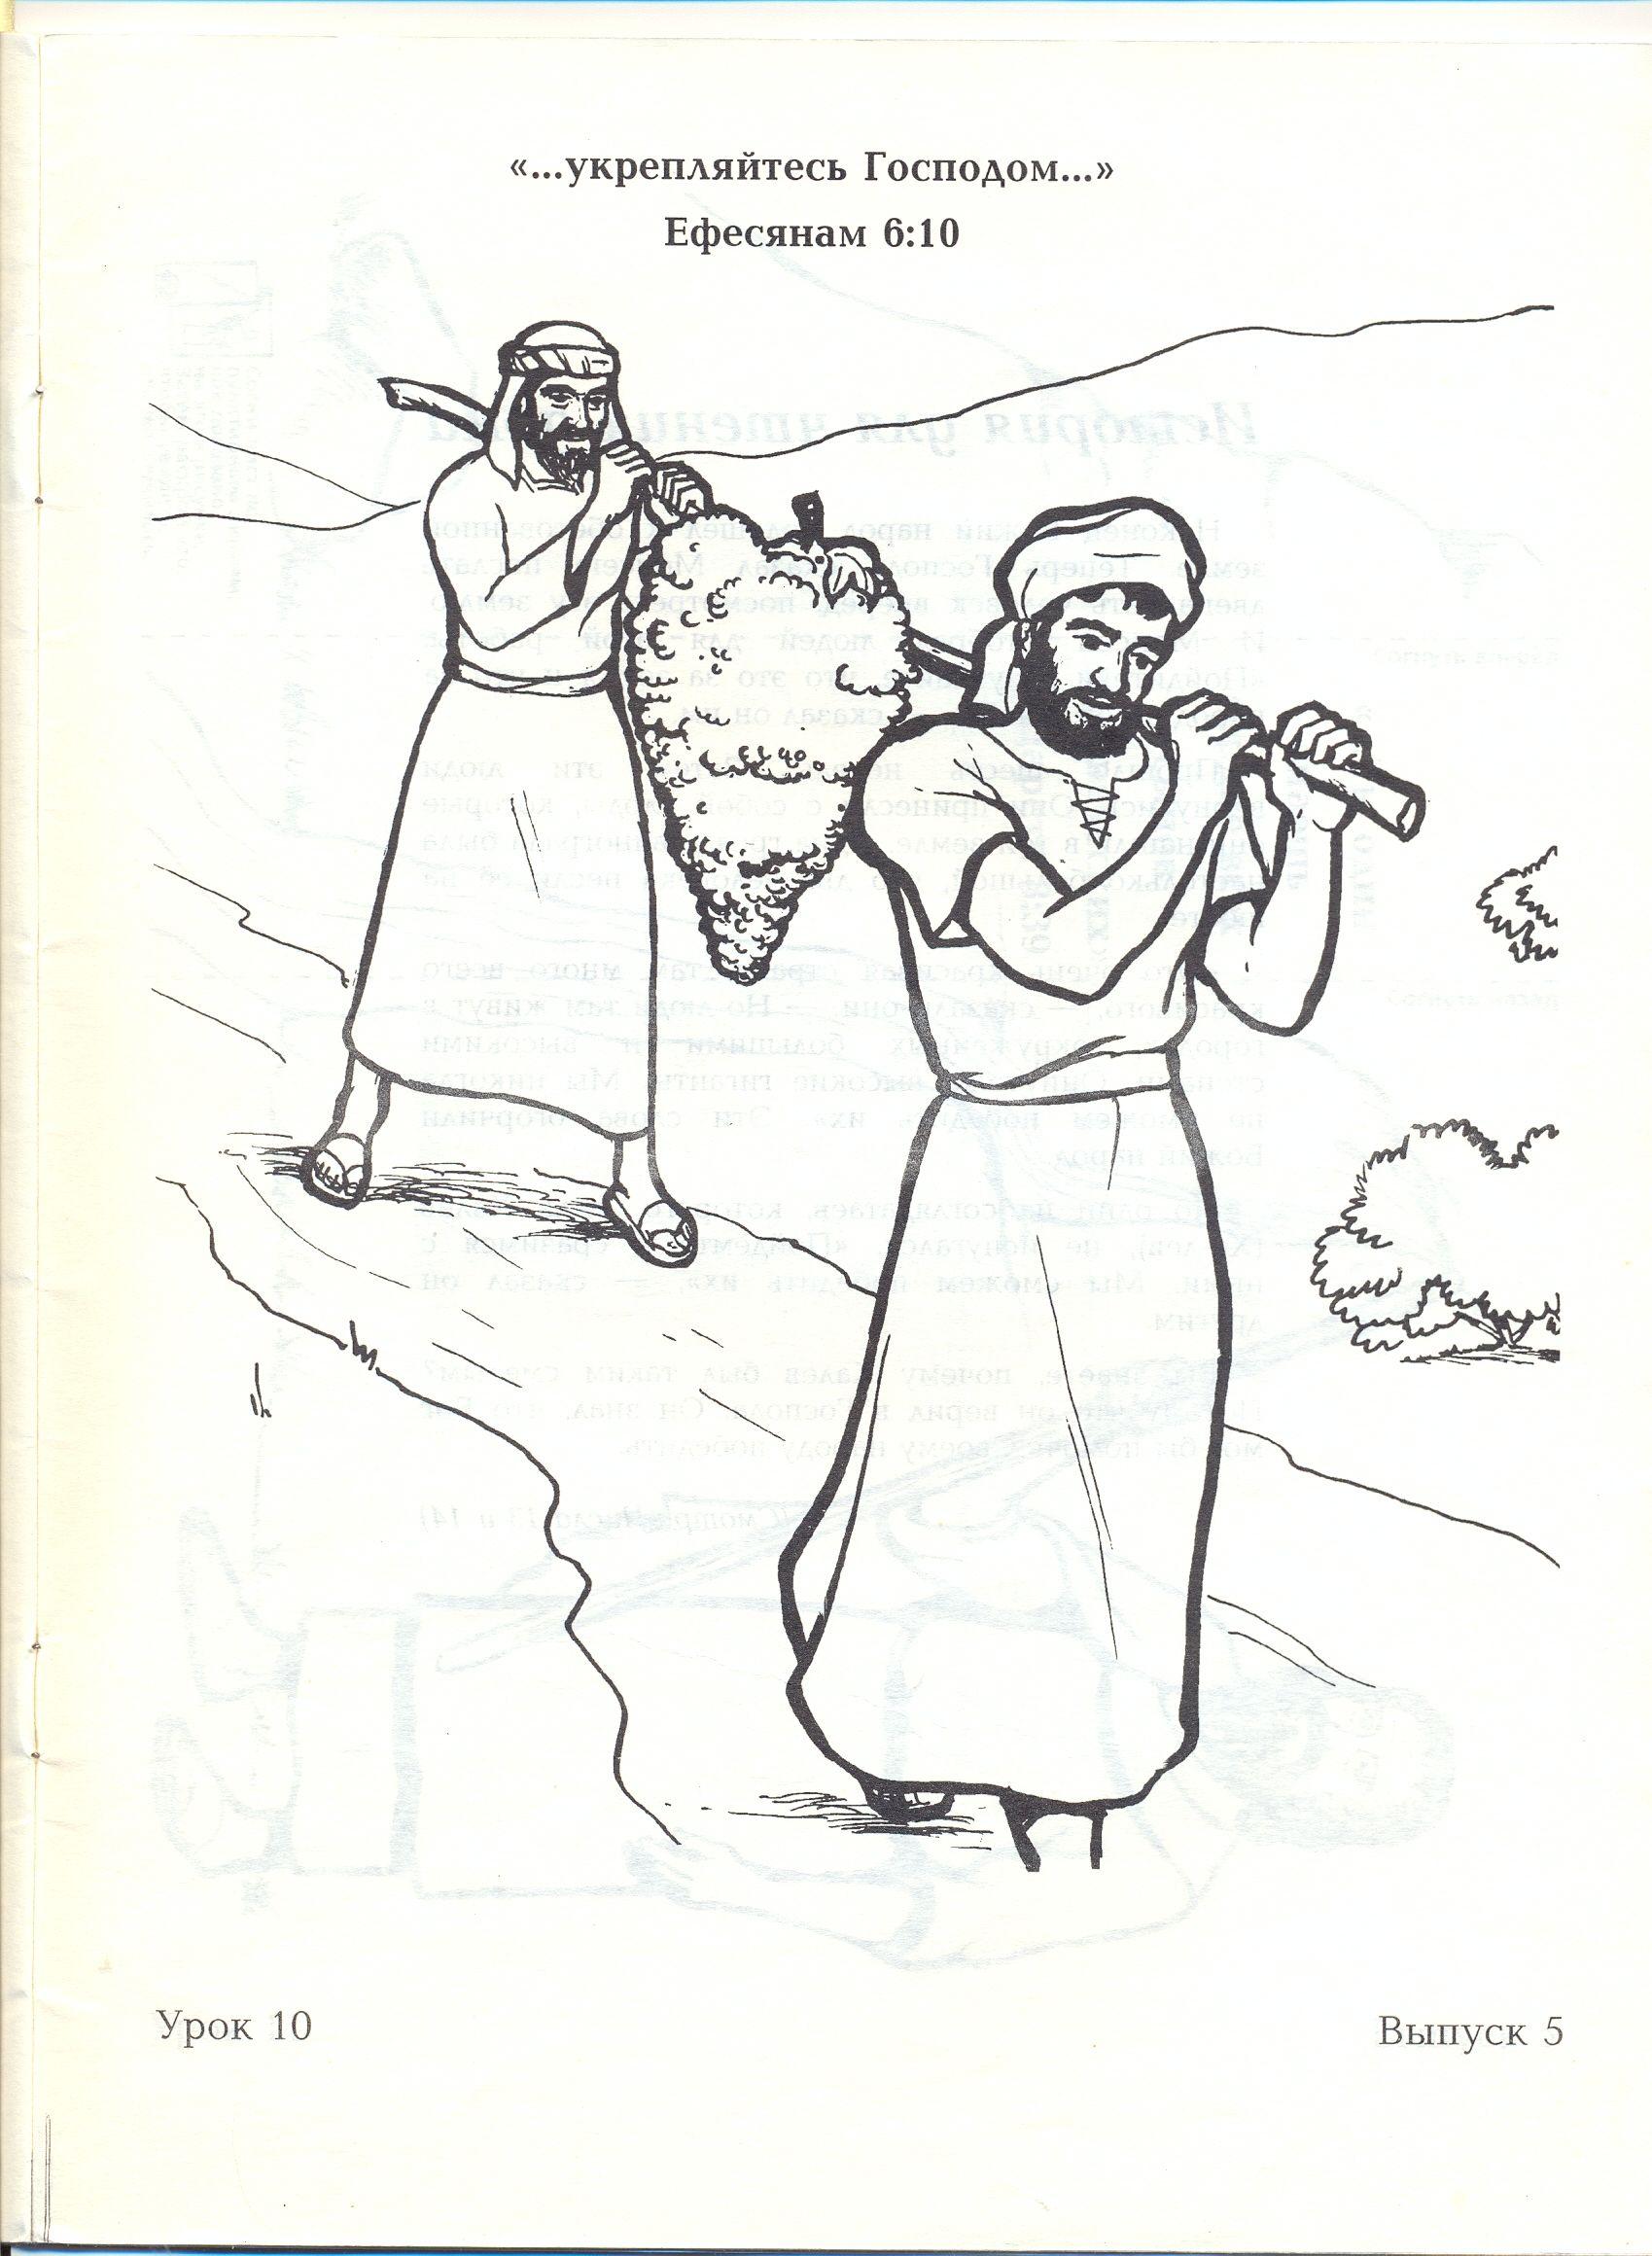 Pin de Olga Shustikova en 10 казней и Моисей | Pinterest | Colorear ...